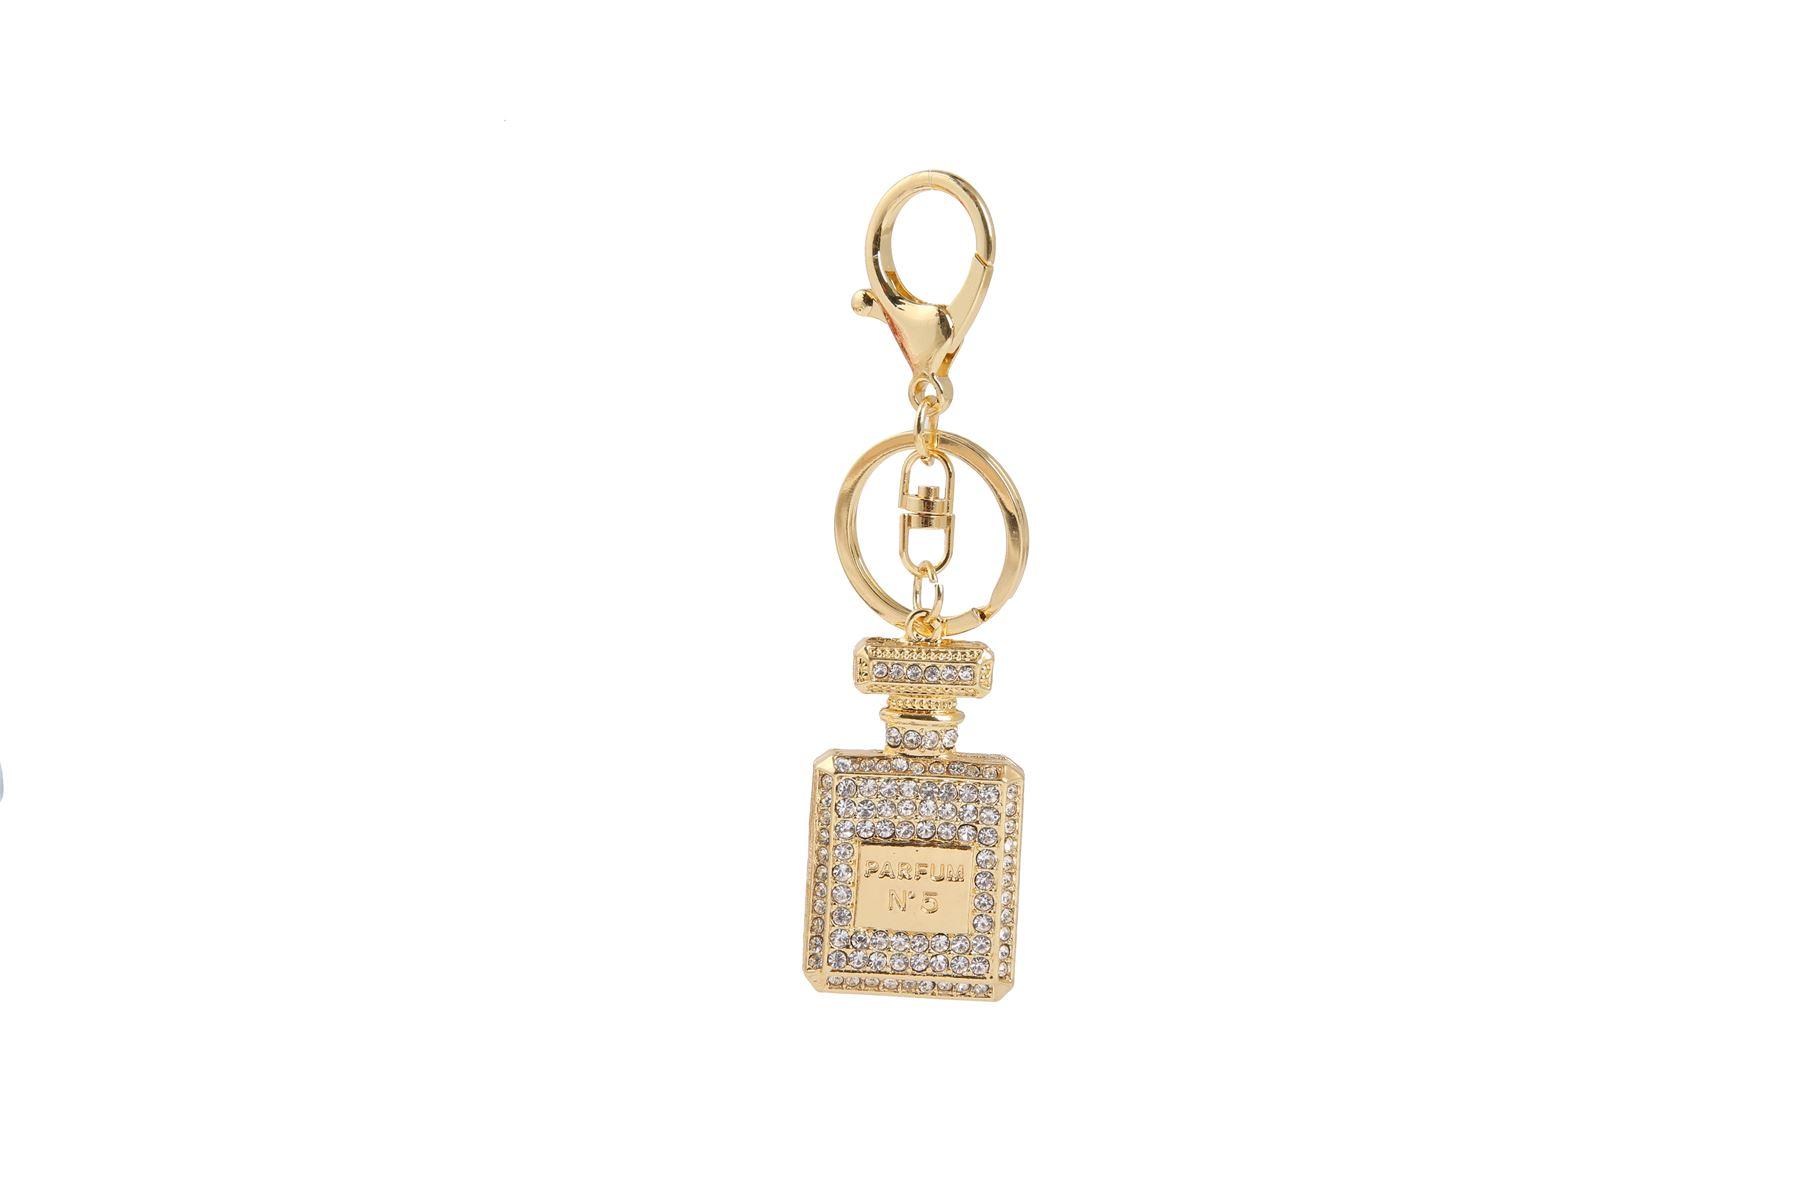 Key-Ring-Bag-Charm-Anime-Character-Rhinestone-Crystal-CZ-Keyring-Keychain-Gift thumbnail 37